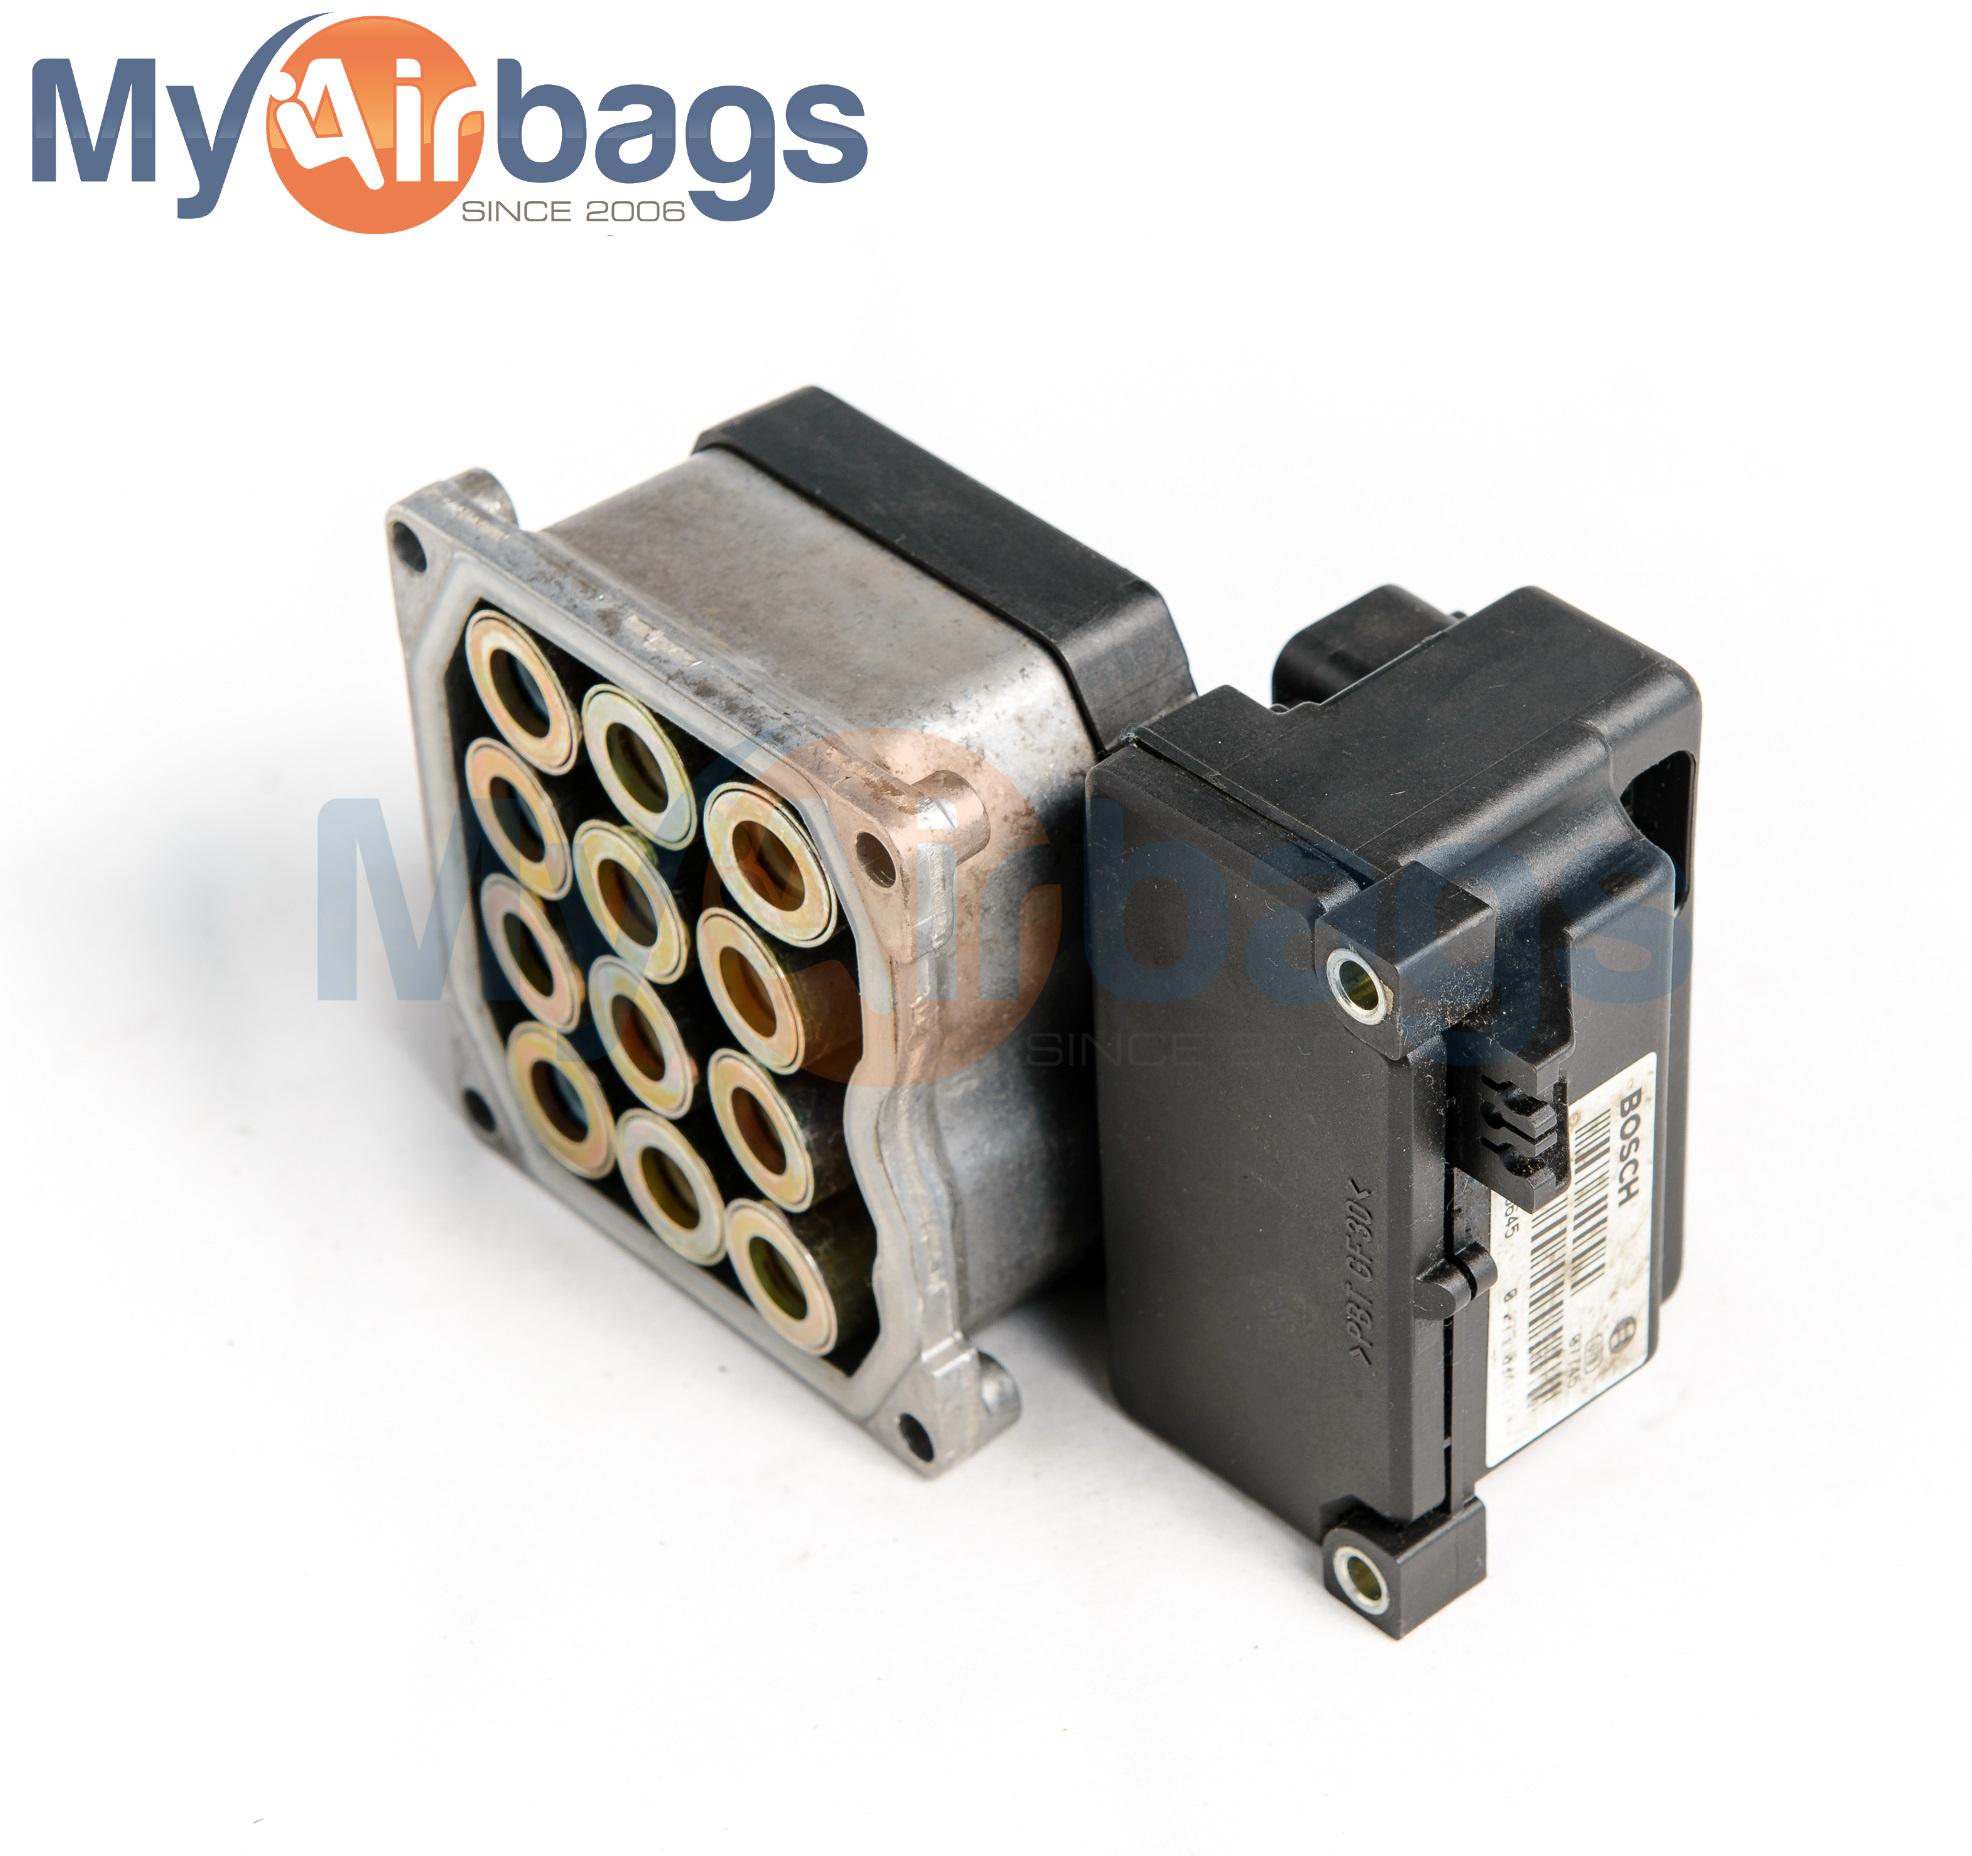 MyAirbags-ABS-Module-BOSCH-5.4-Img2